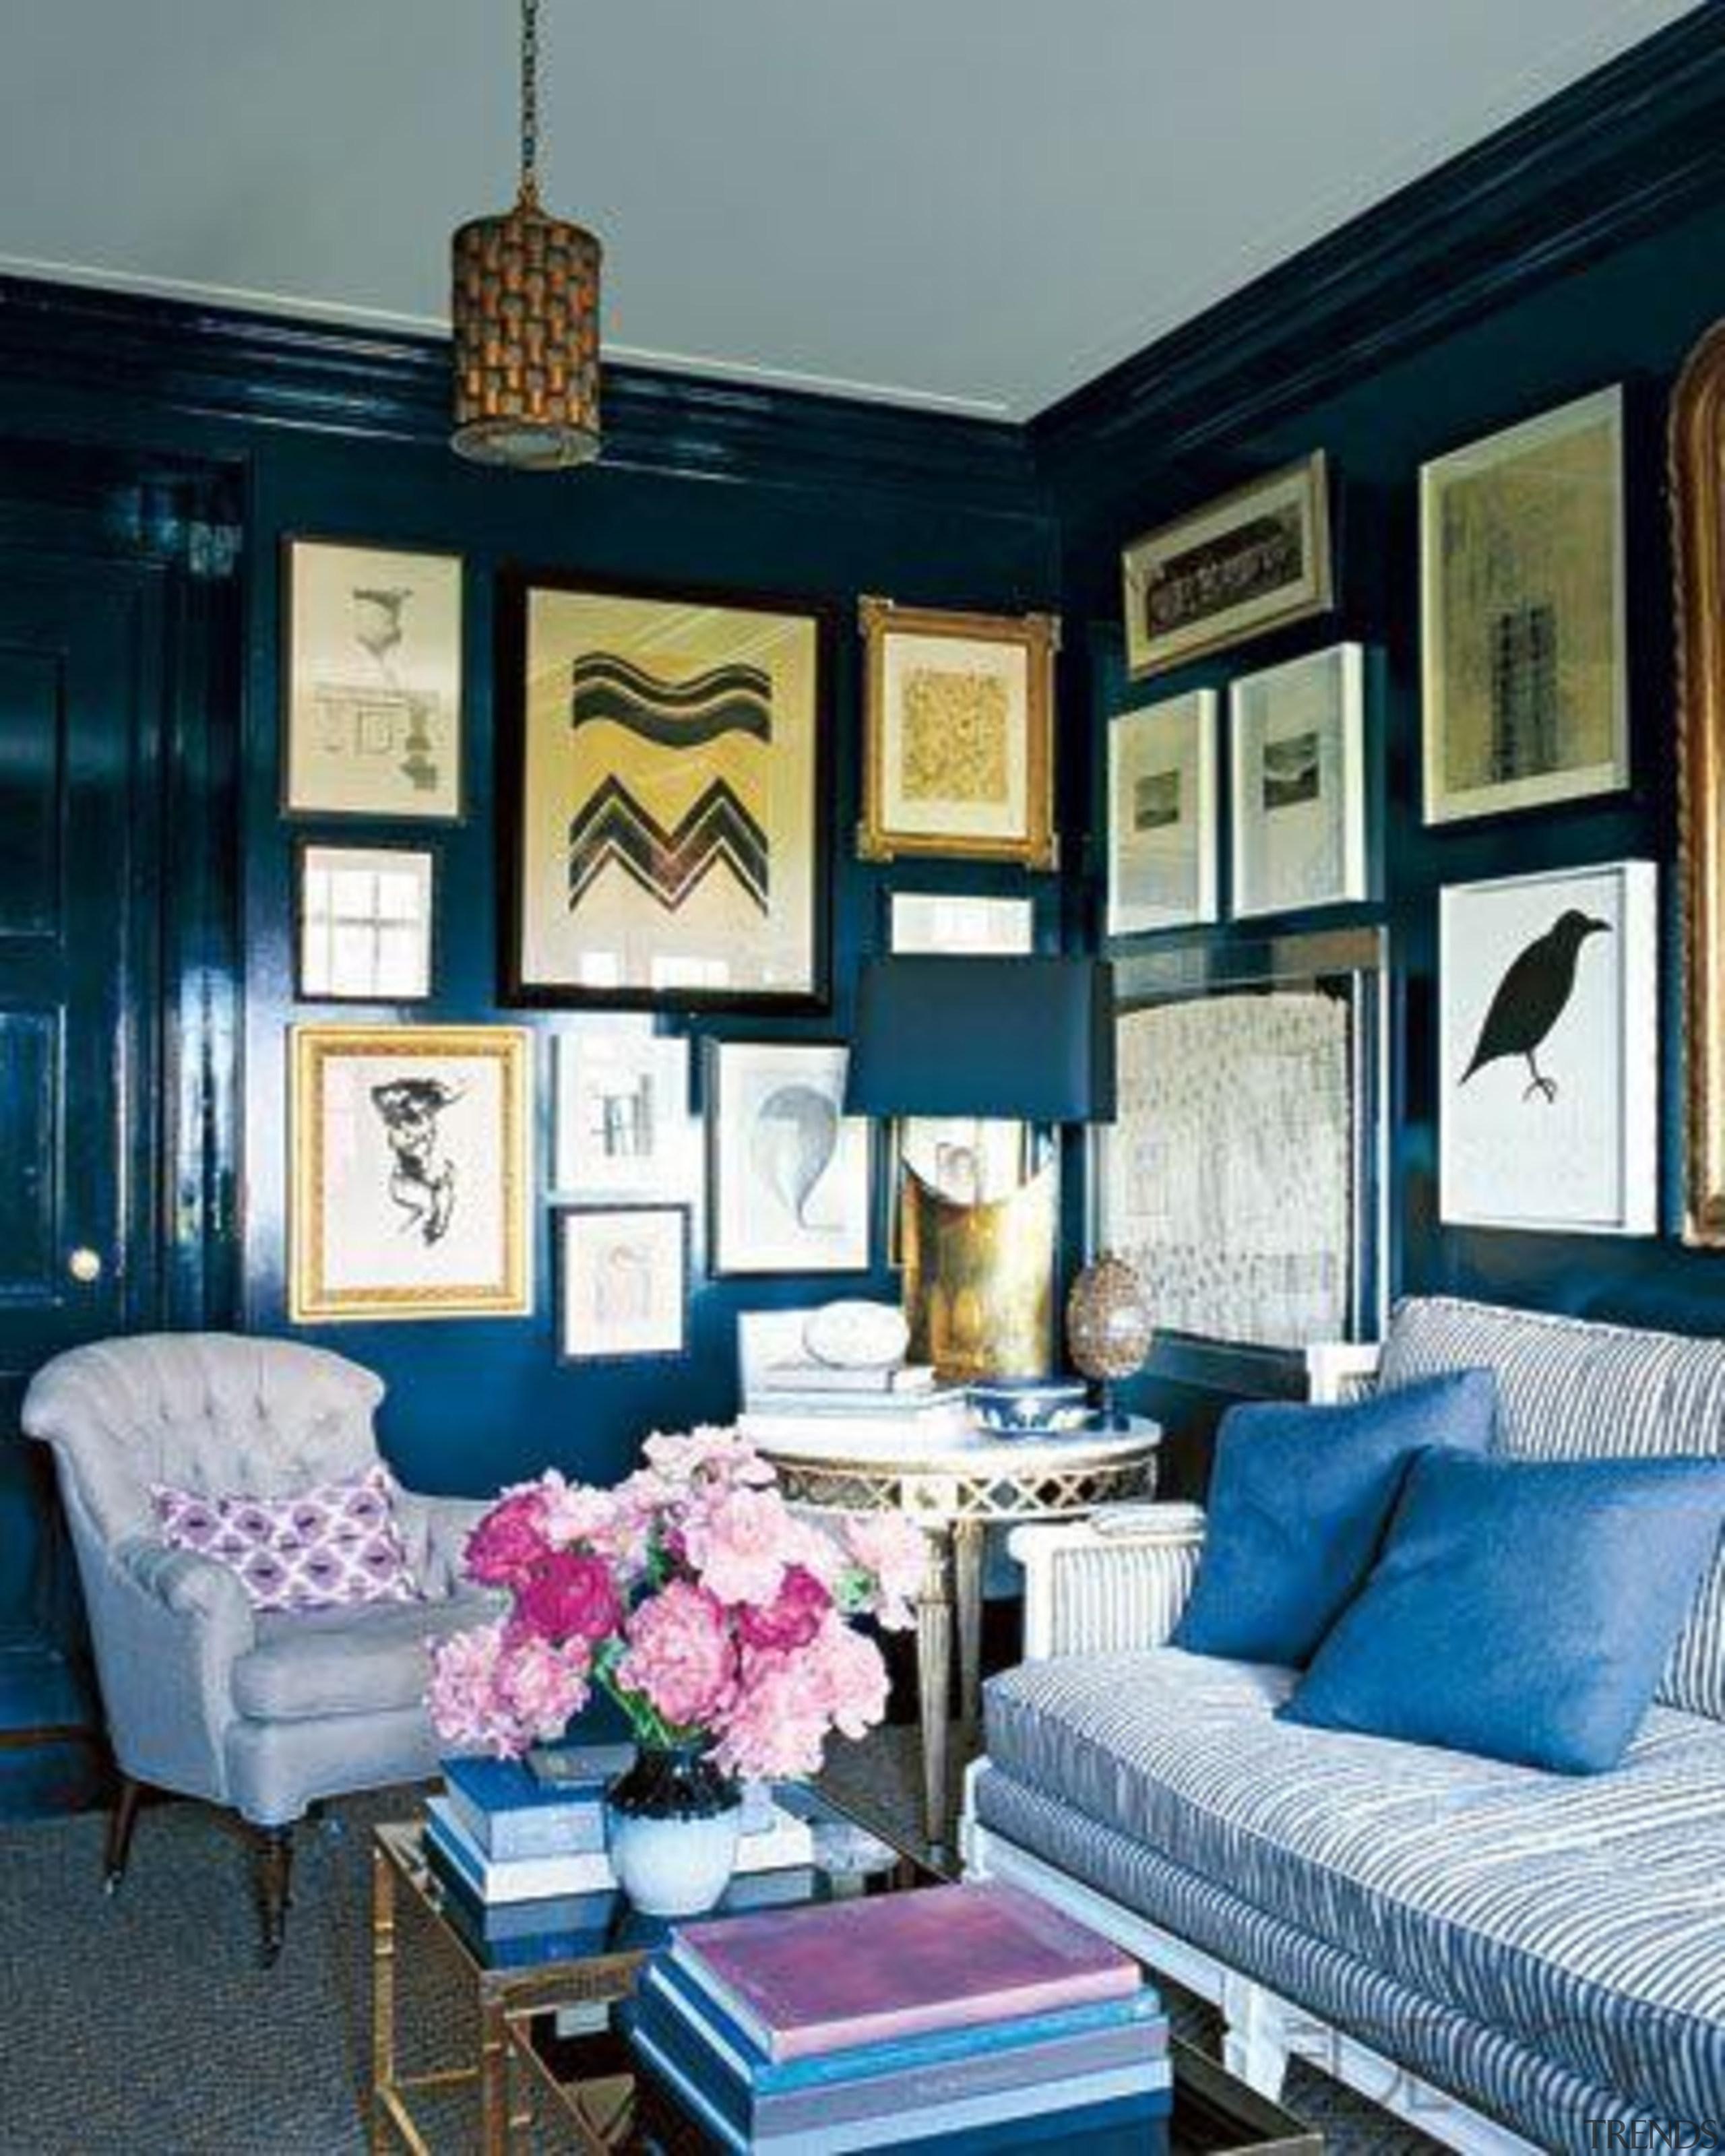 cerulean elledecorcom.jpg - cerulean_elledecorcom.jpg - blue | furniture blue, furniture, home, interior design, living room, room, wall, window